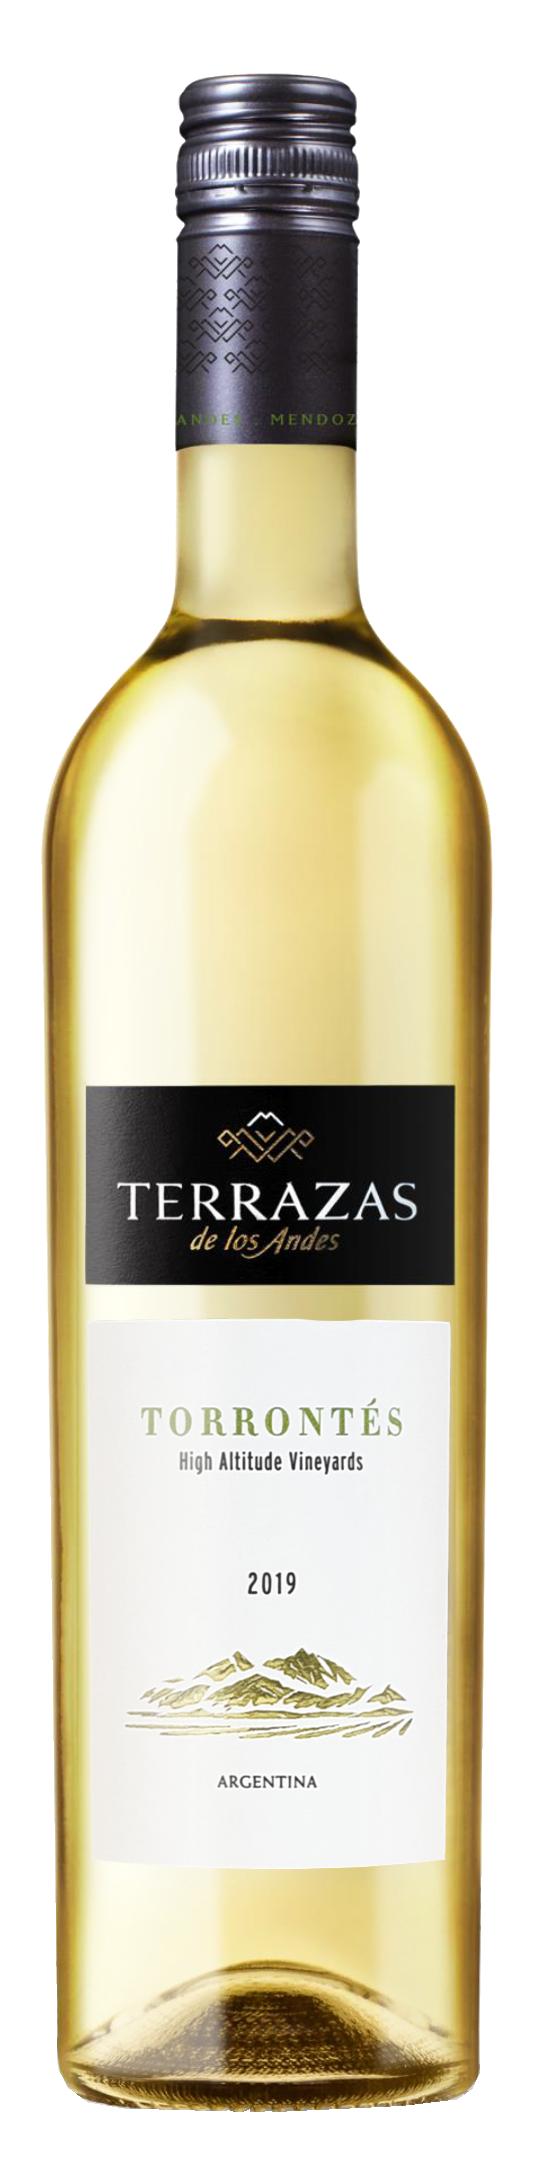 Terrazas de los Andes Reserva Torrontes магазин склад winewine